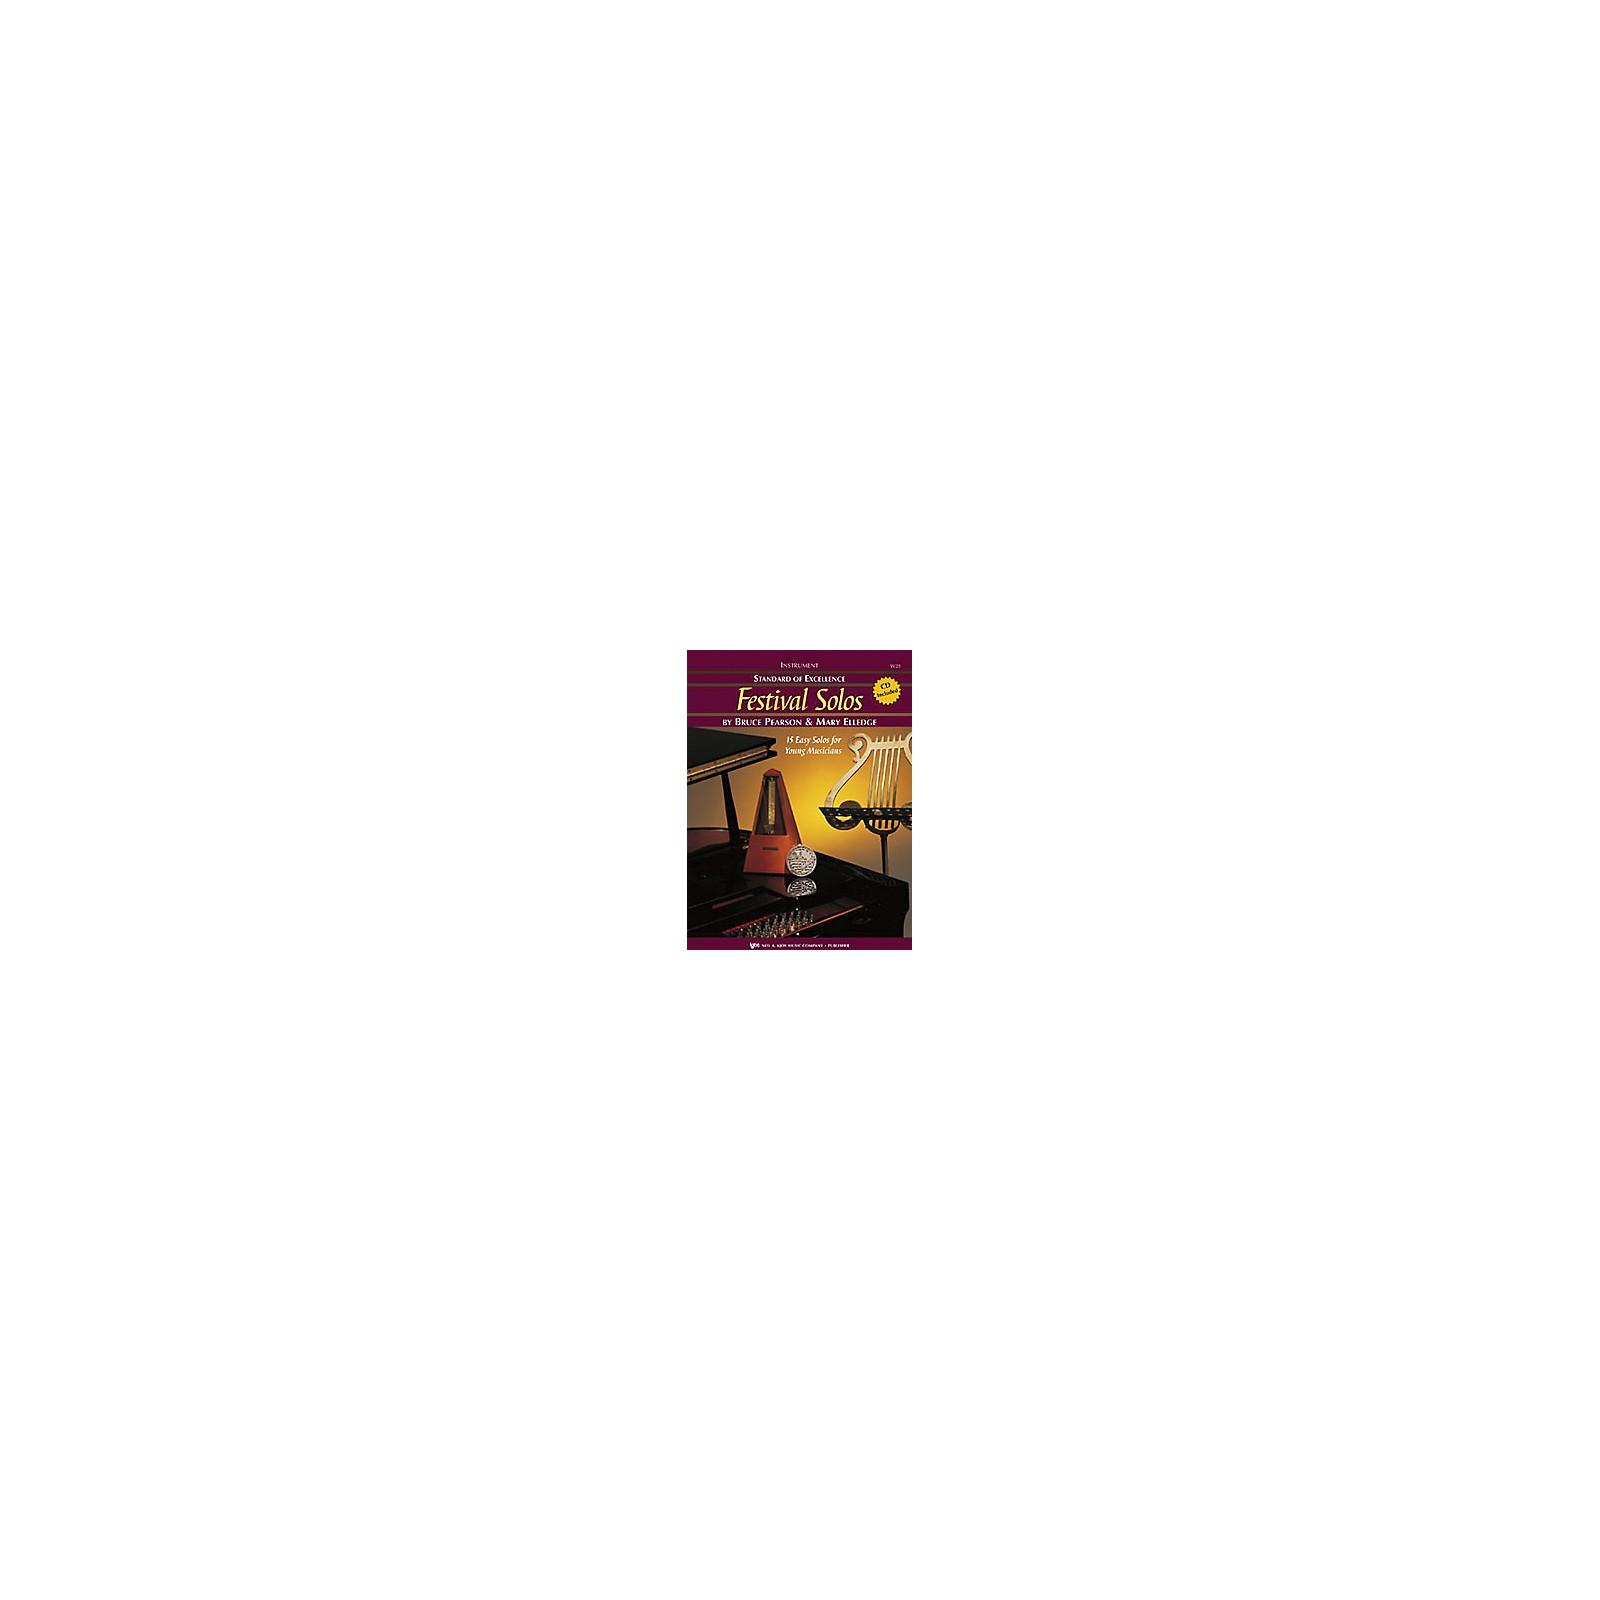 KJOS Festival Solos, Book 1 - Clarinet